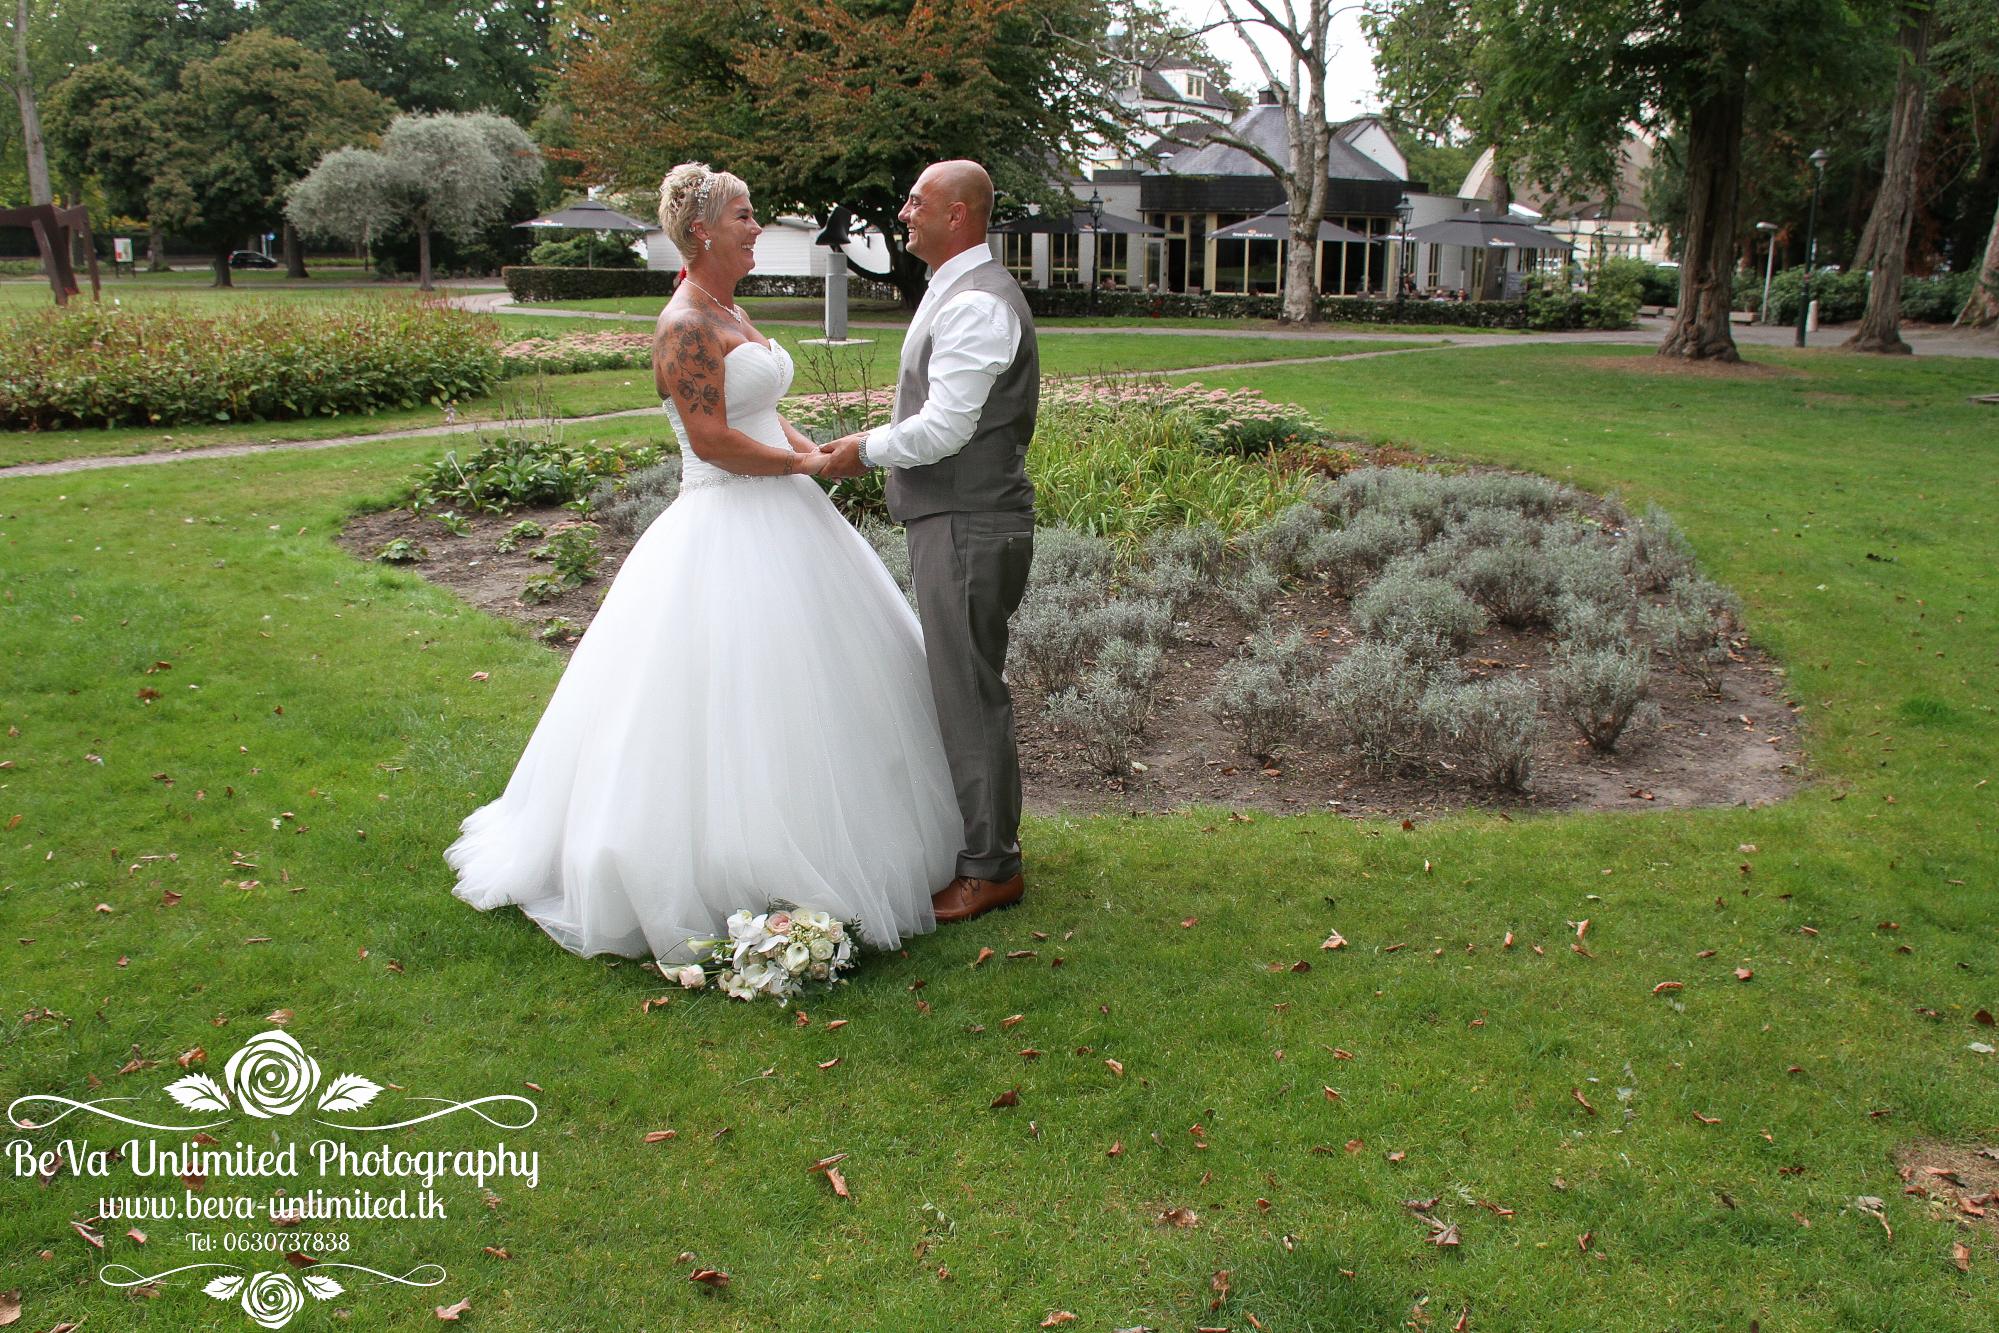 Bruiloft Eric & Bianca 4-9-2020-682